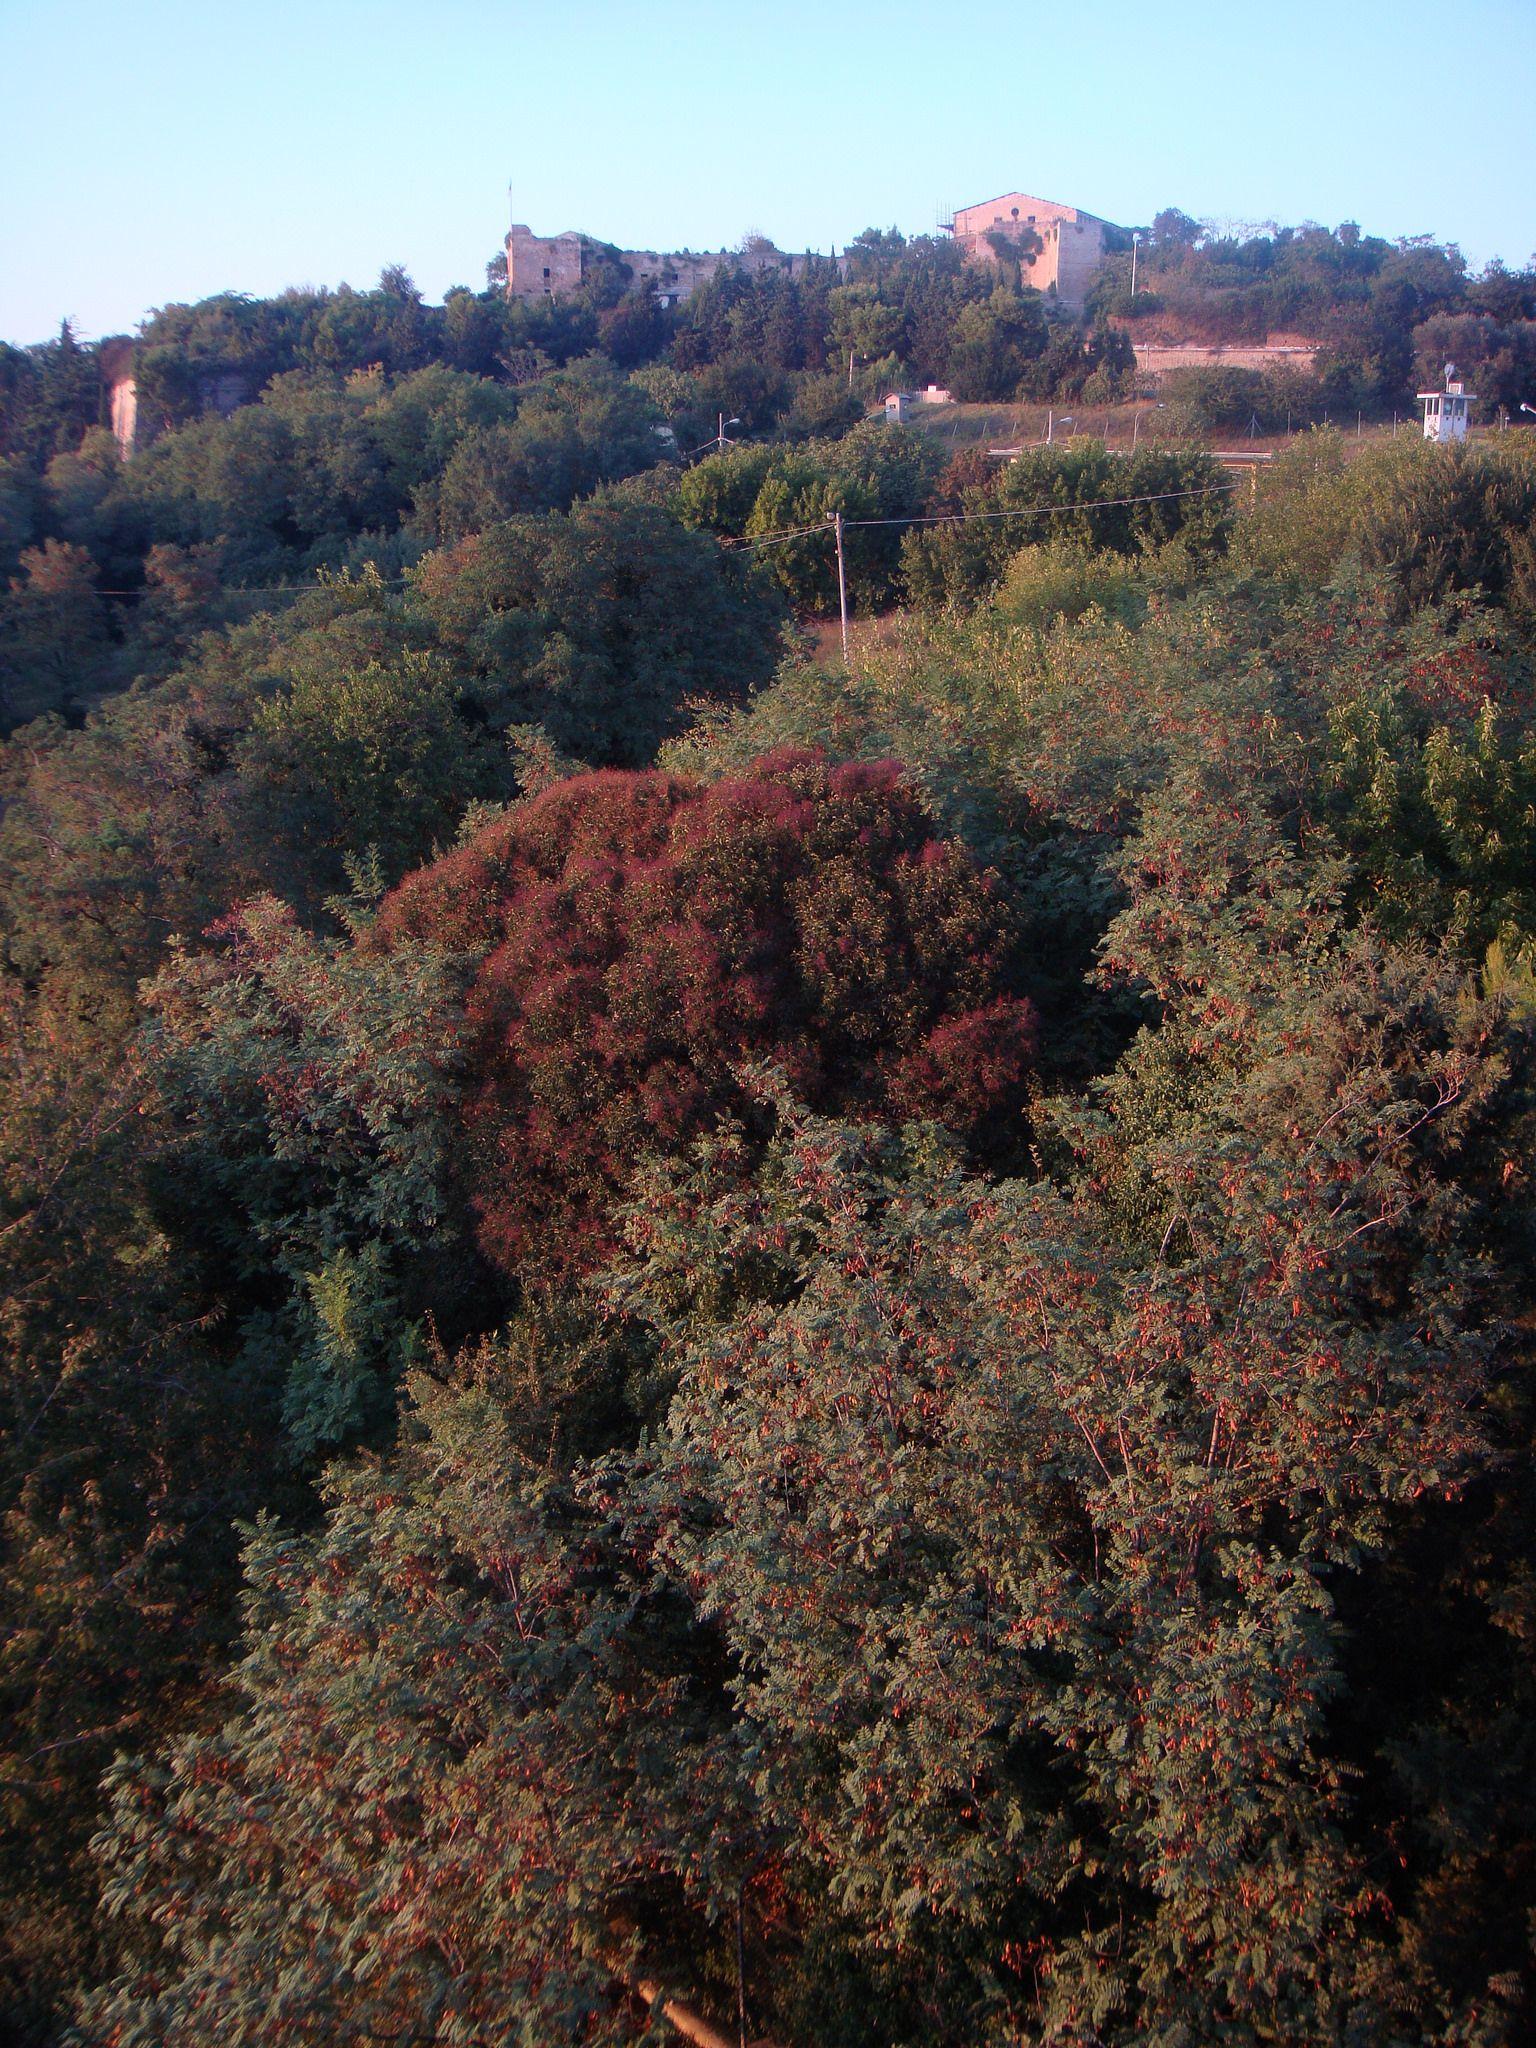 Ancona,Marche, Italy- Cittadella's Trees  in Autumn 2009 -by Gianni Del Bufalo (CC BY-NC-SA 2.0)